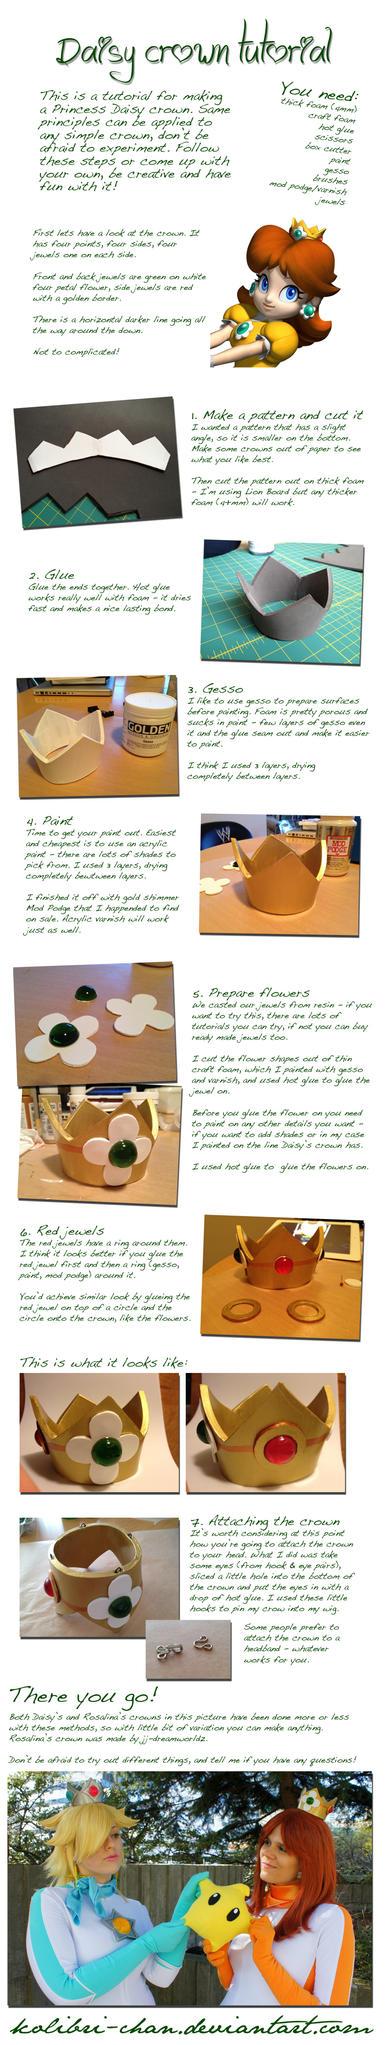 Princess Daisy crown tutorial by kolibri-chan